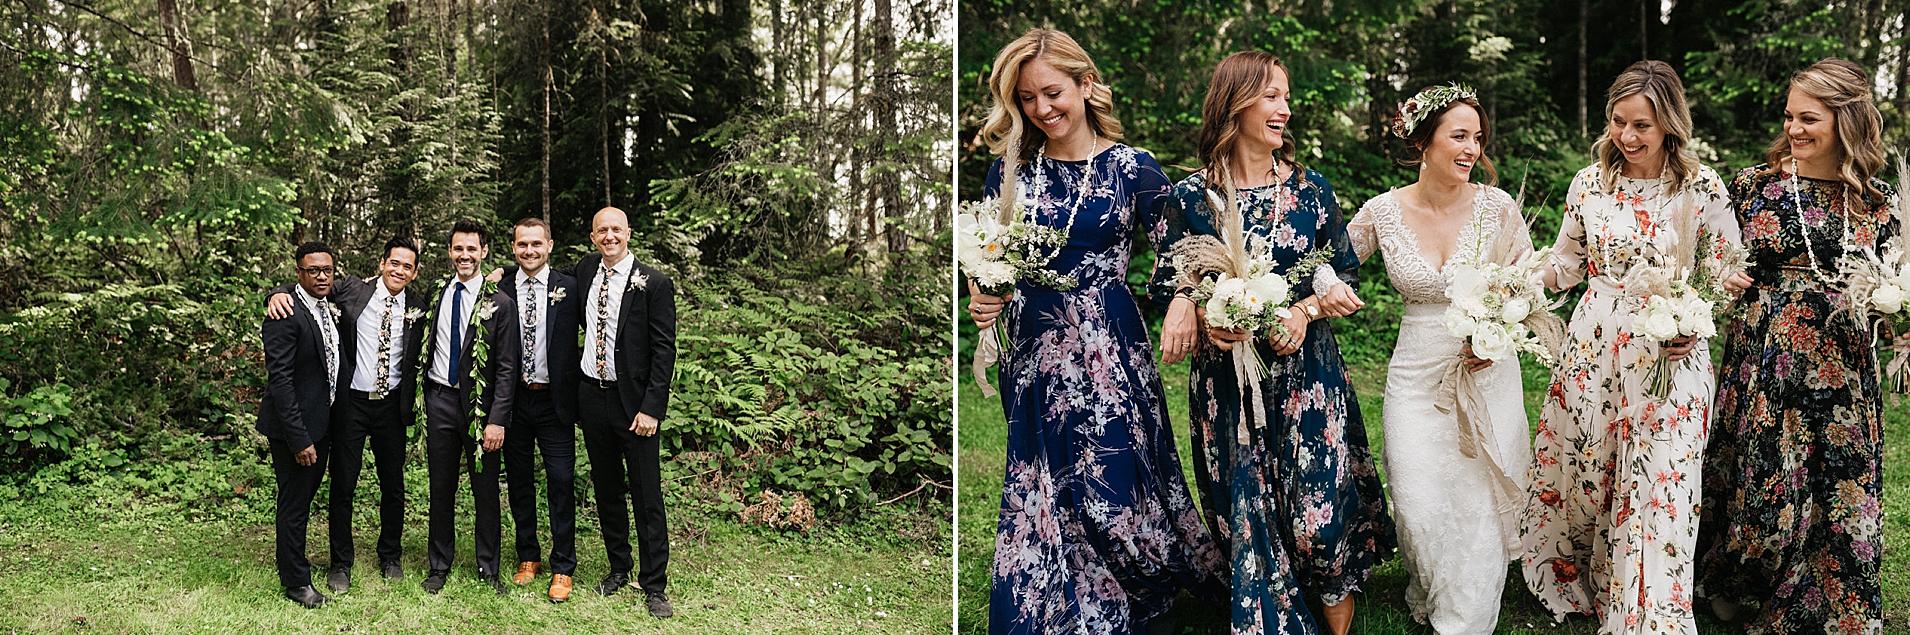 bridesmaids and groomsmen bodega ridge.jpg